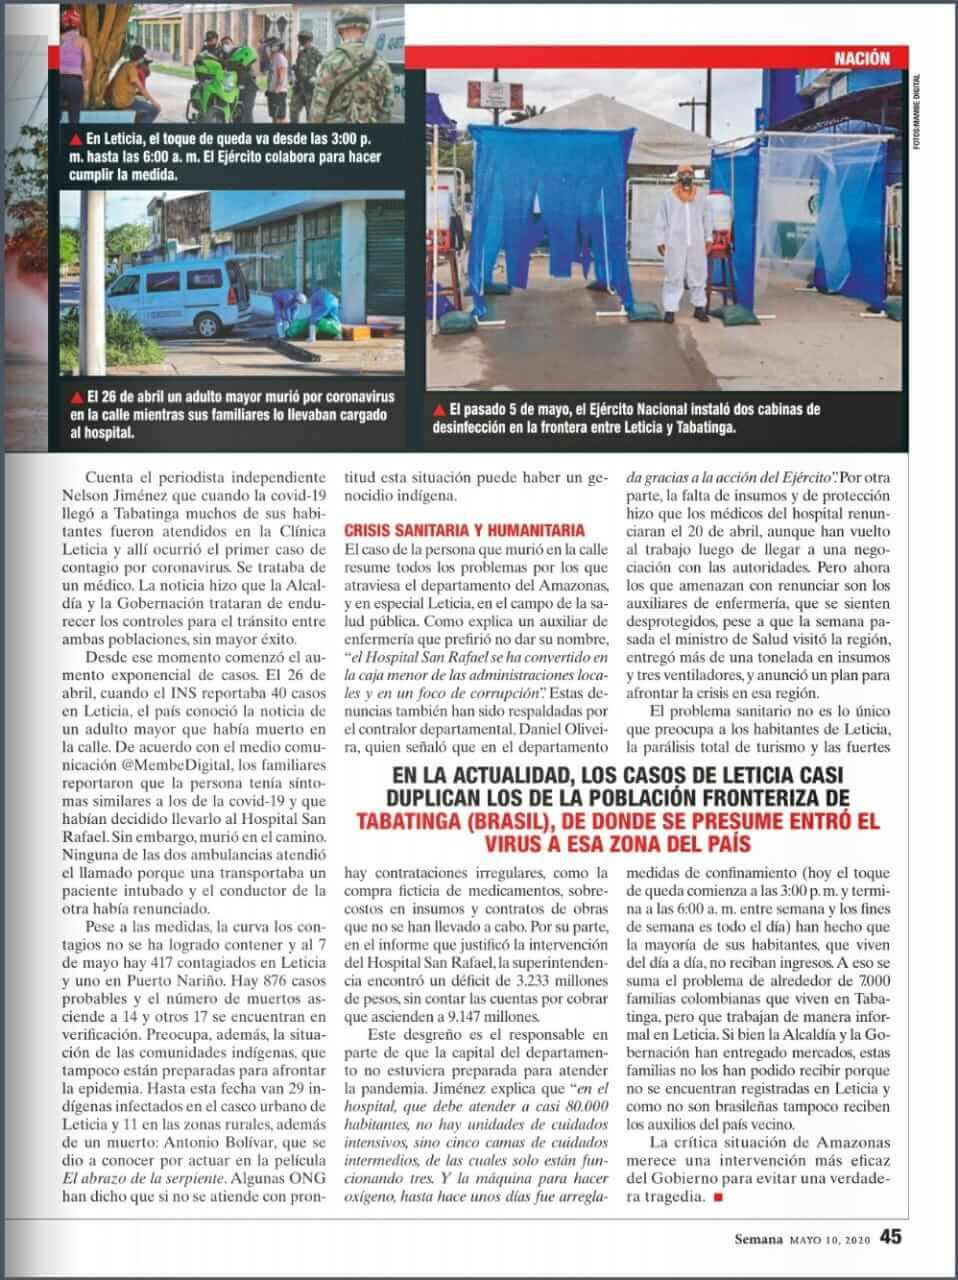 Revista Semana 2